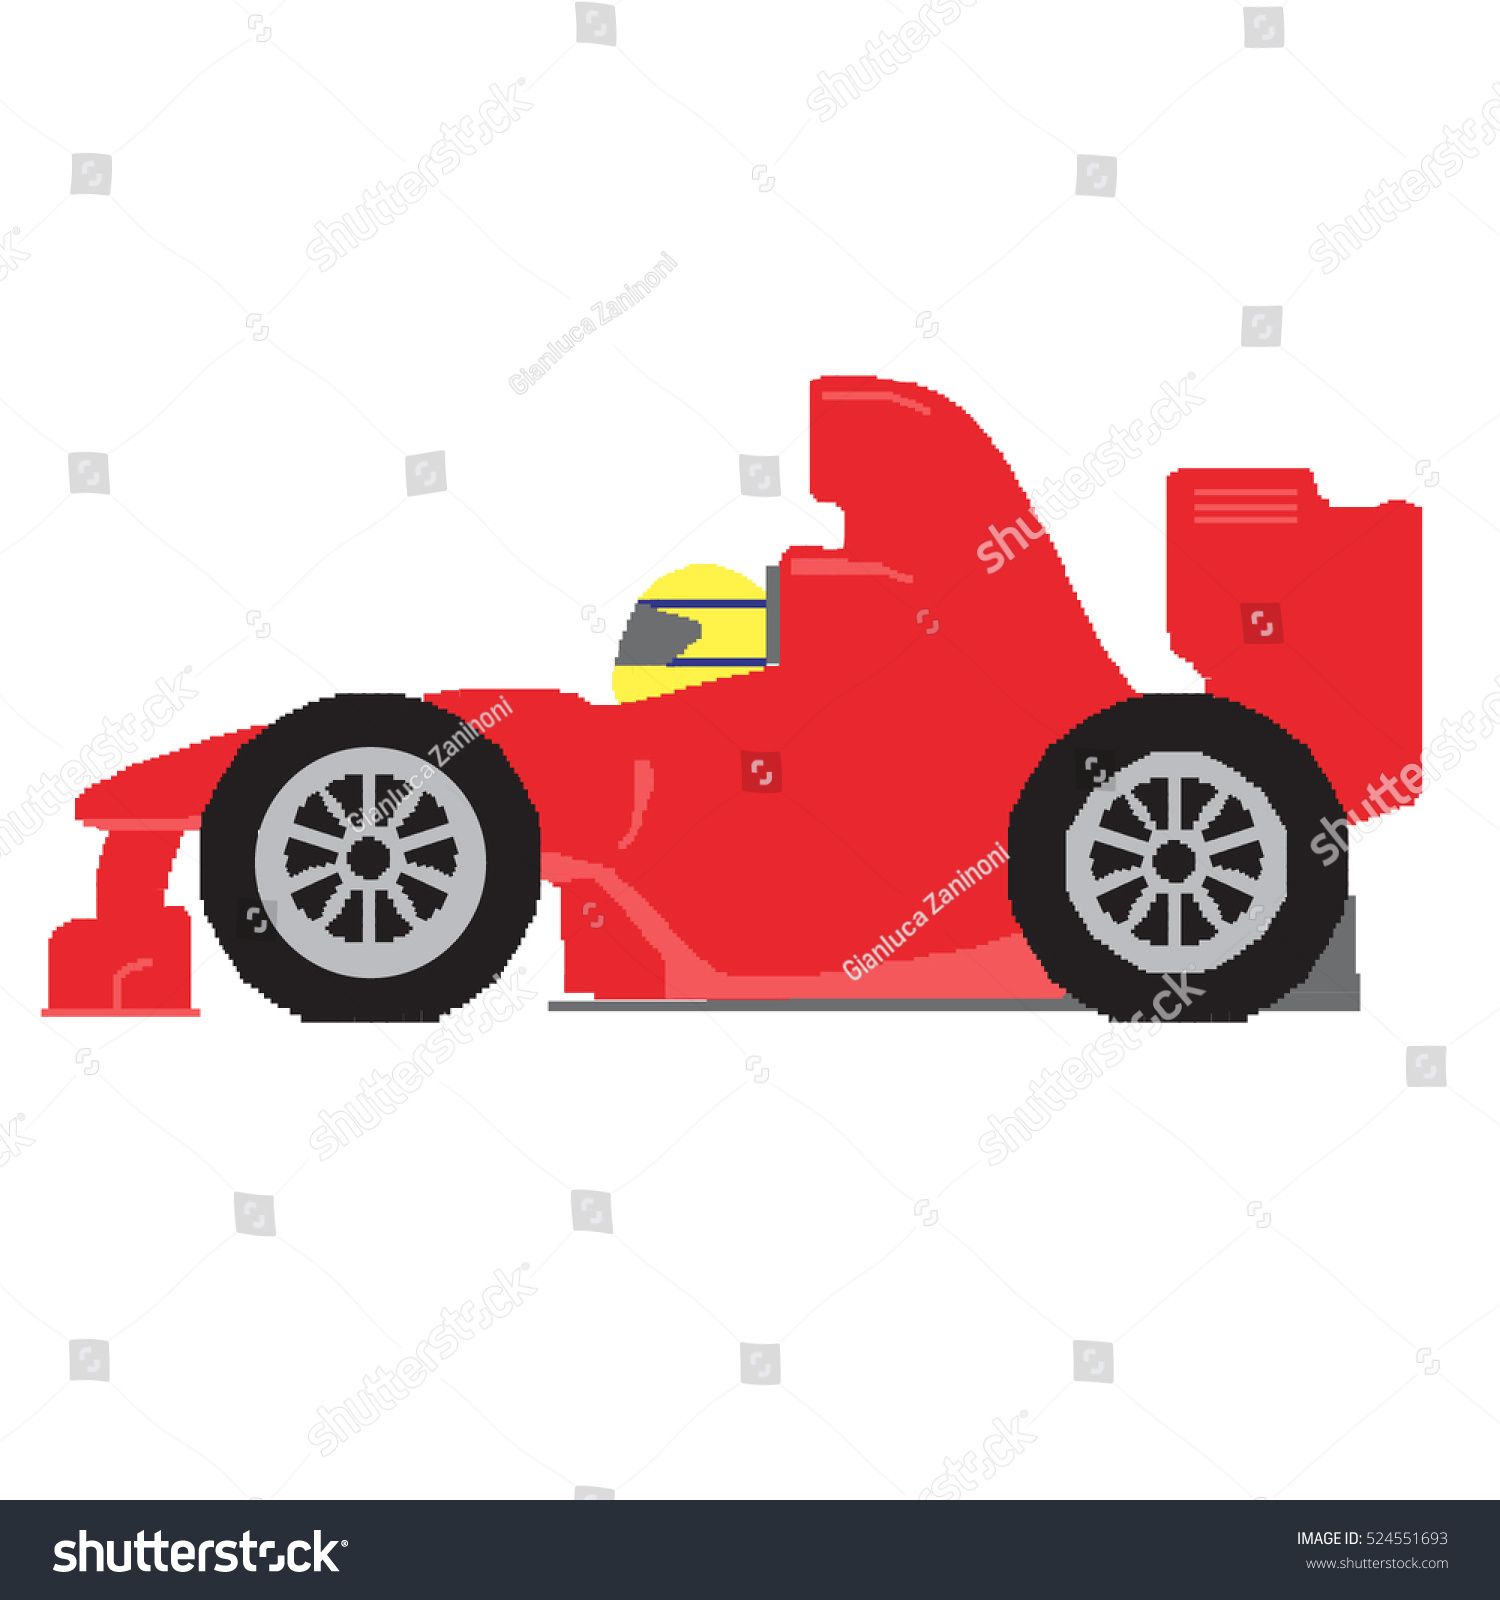 Isolation Full Roblox Id Formula 1 Sport Car Pixel Art Stock Vector Royalty Free 524551693